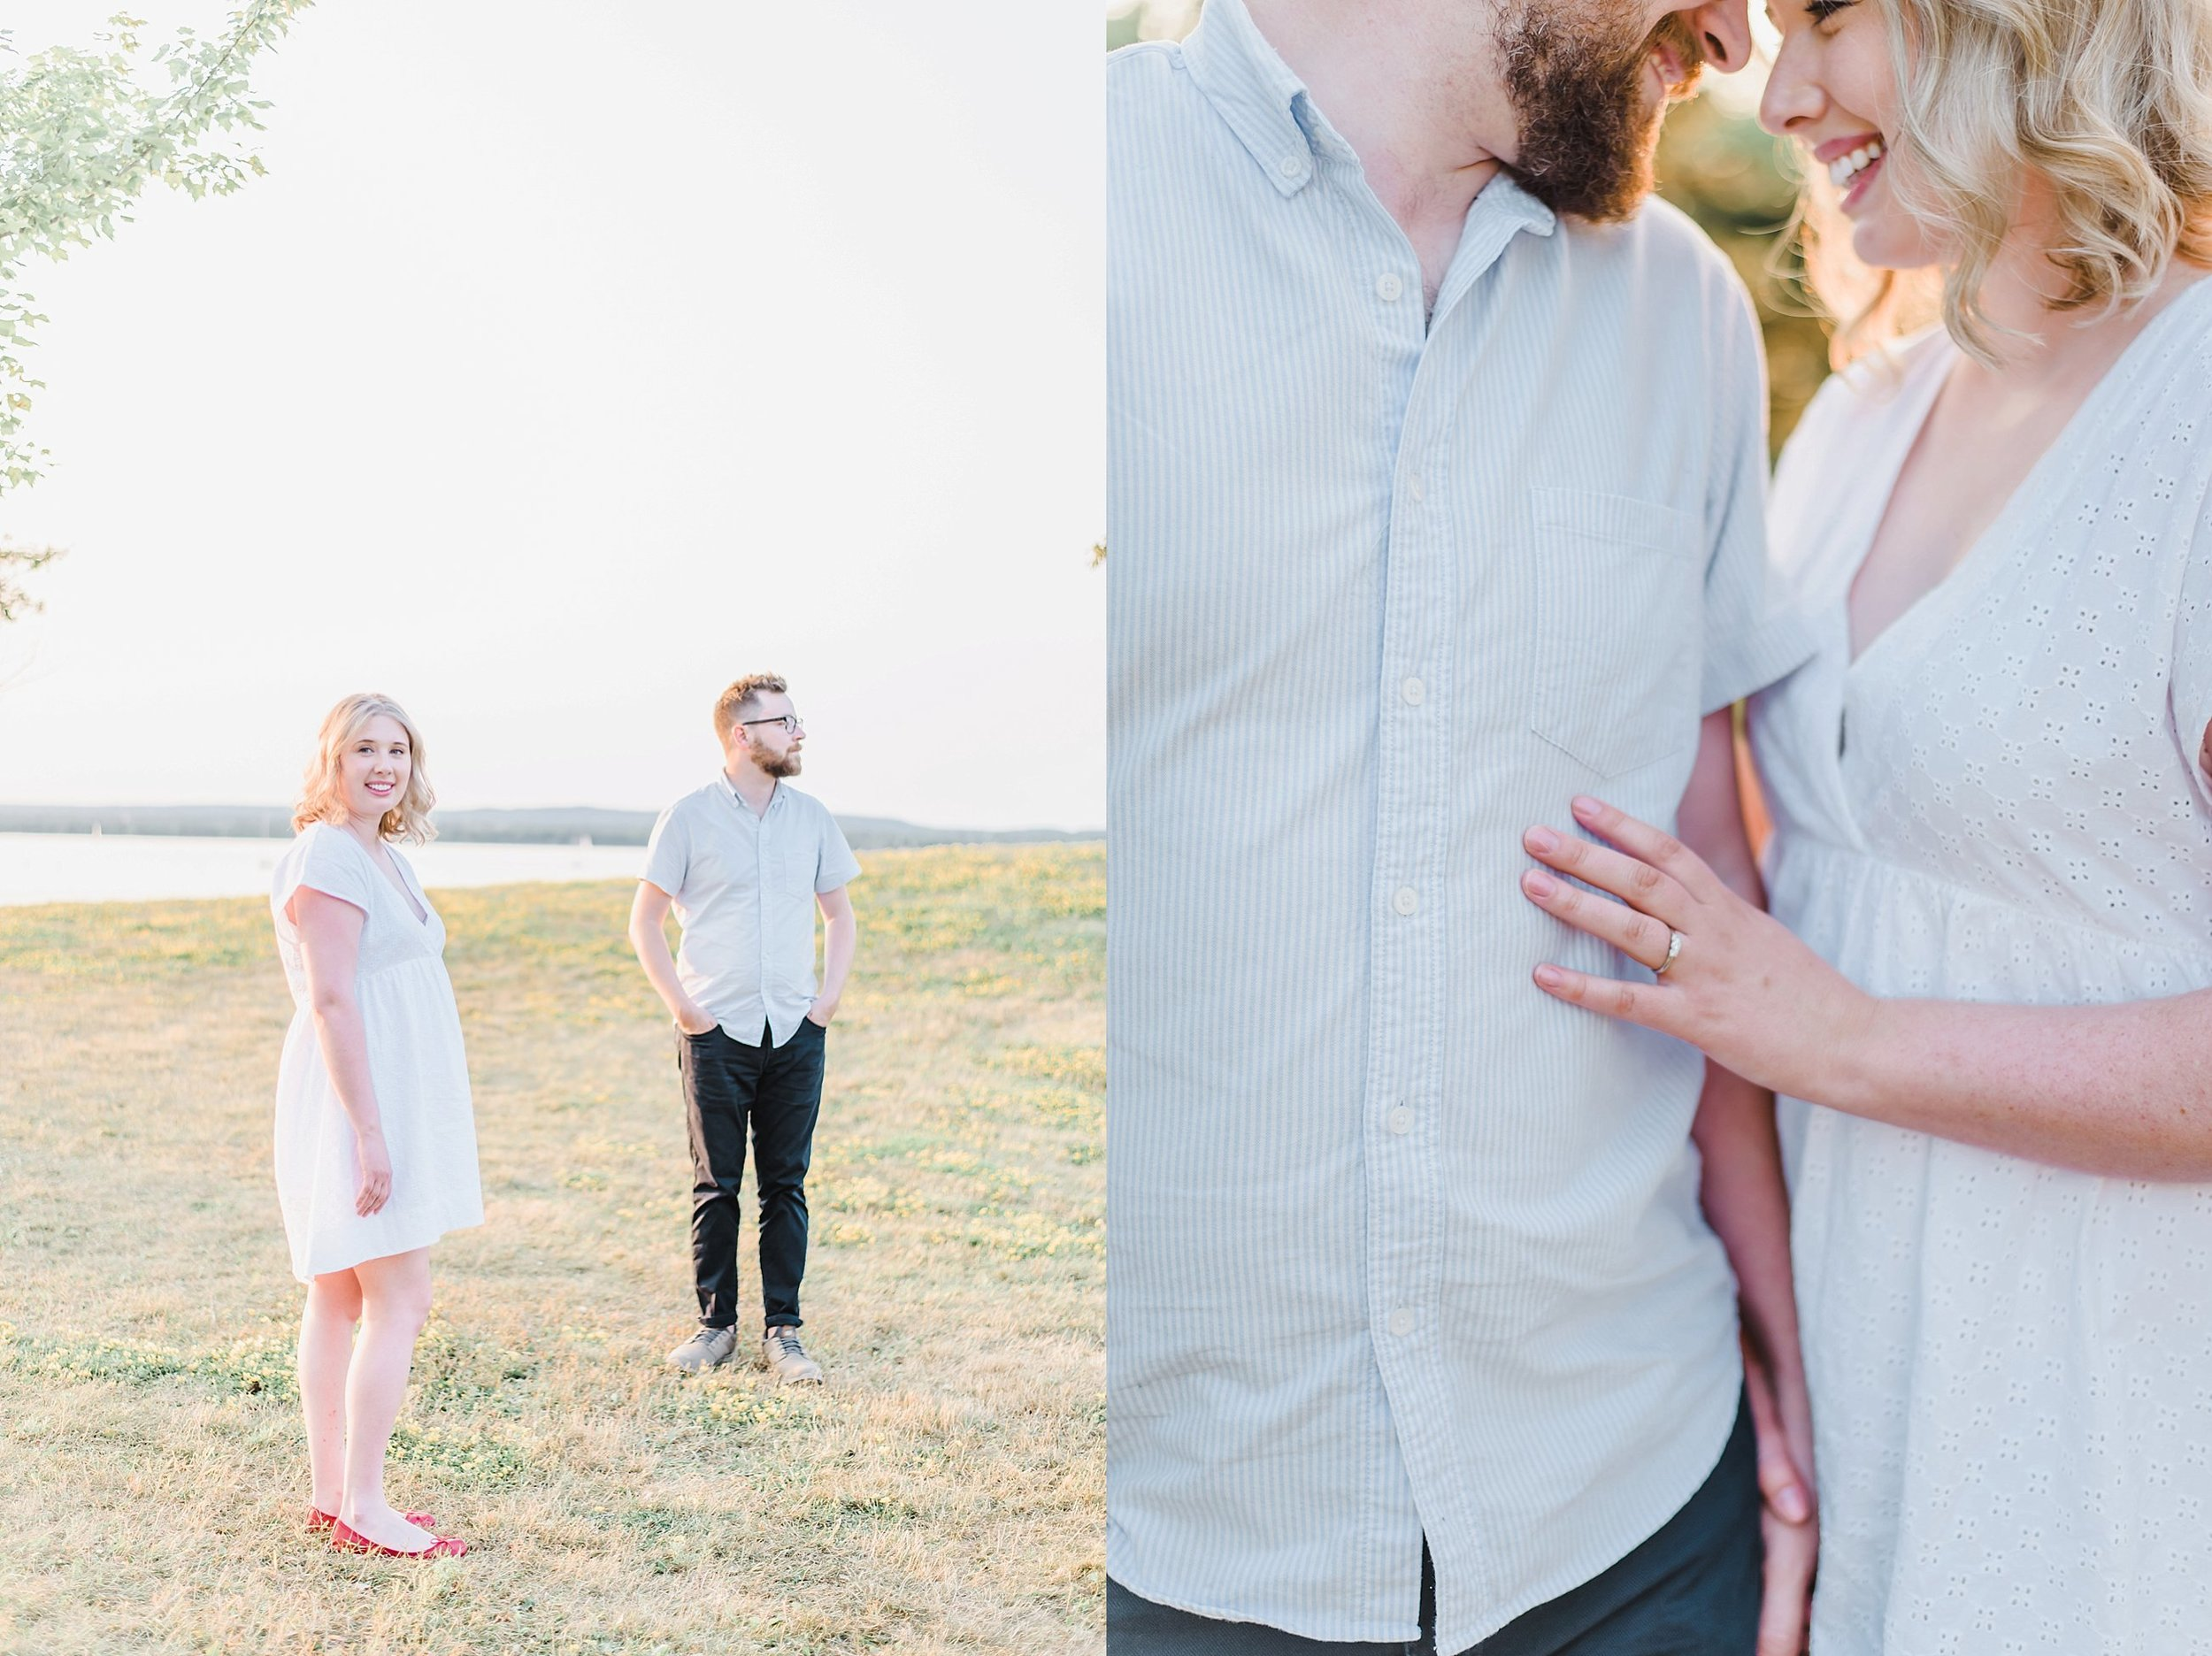 light airy indie fine art ottawa wedding photographer | Ali and Batoul Photography_0301.jpg